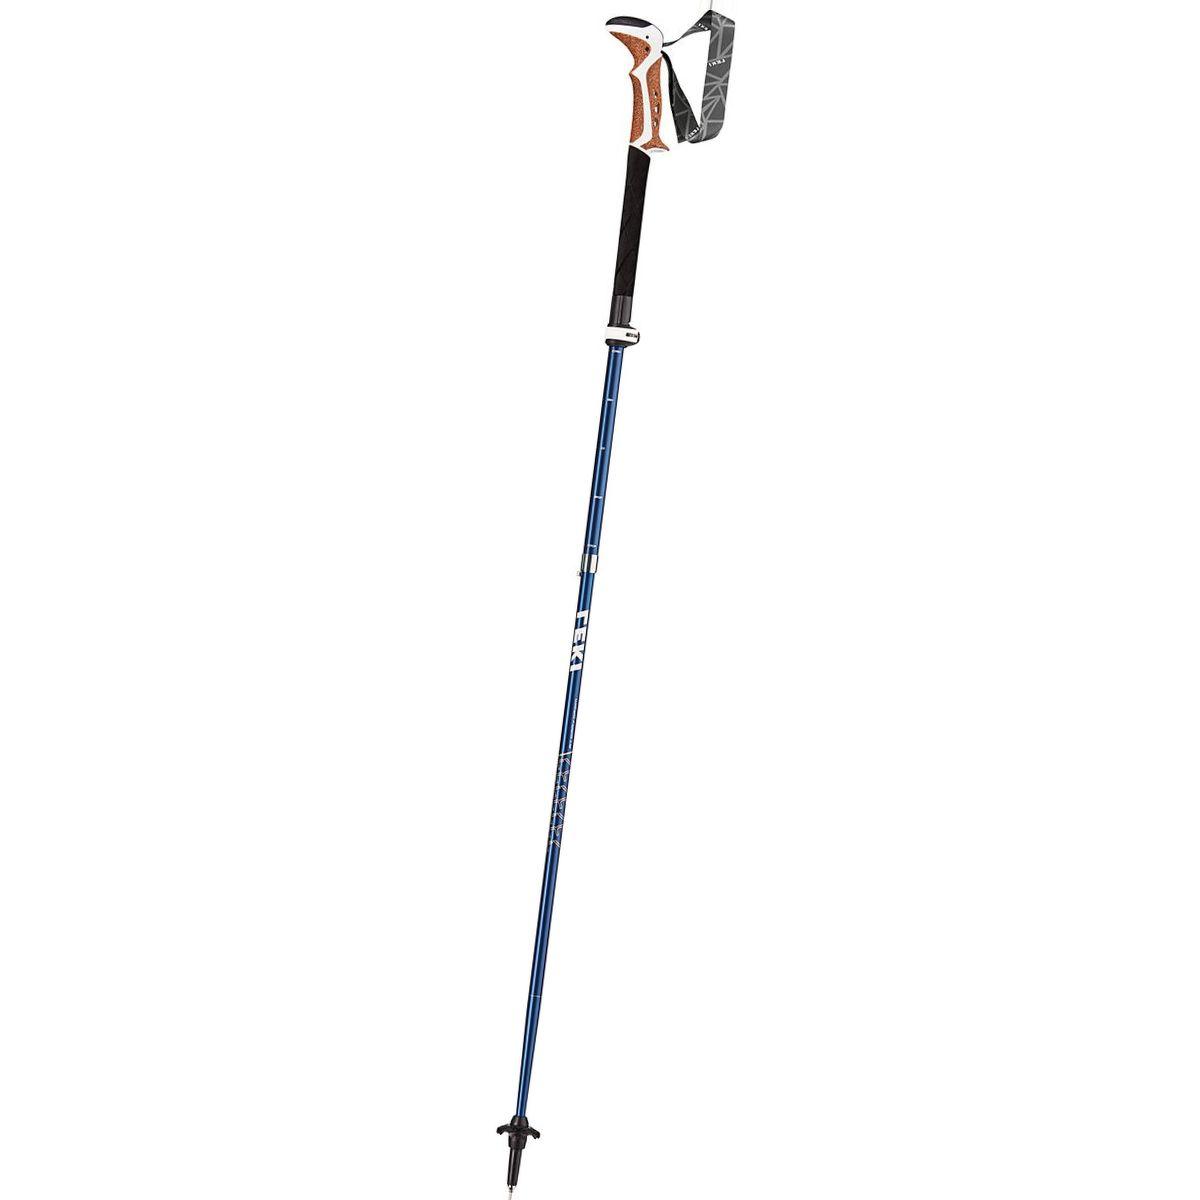 LEKI Micro Vario Cor-Tec TA Trekking Poles - Women's